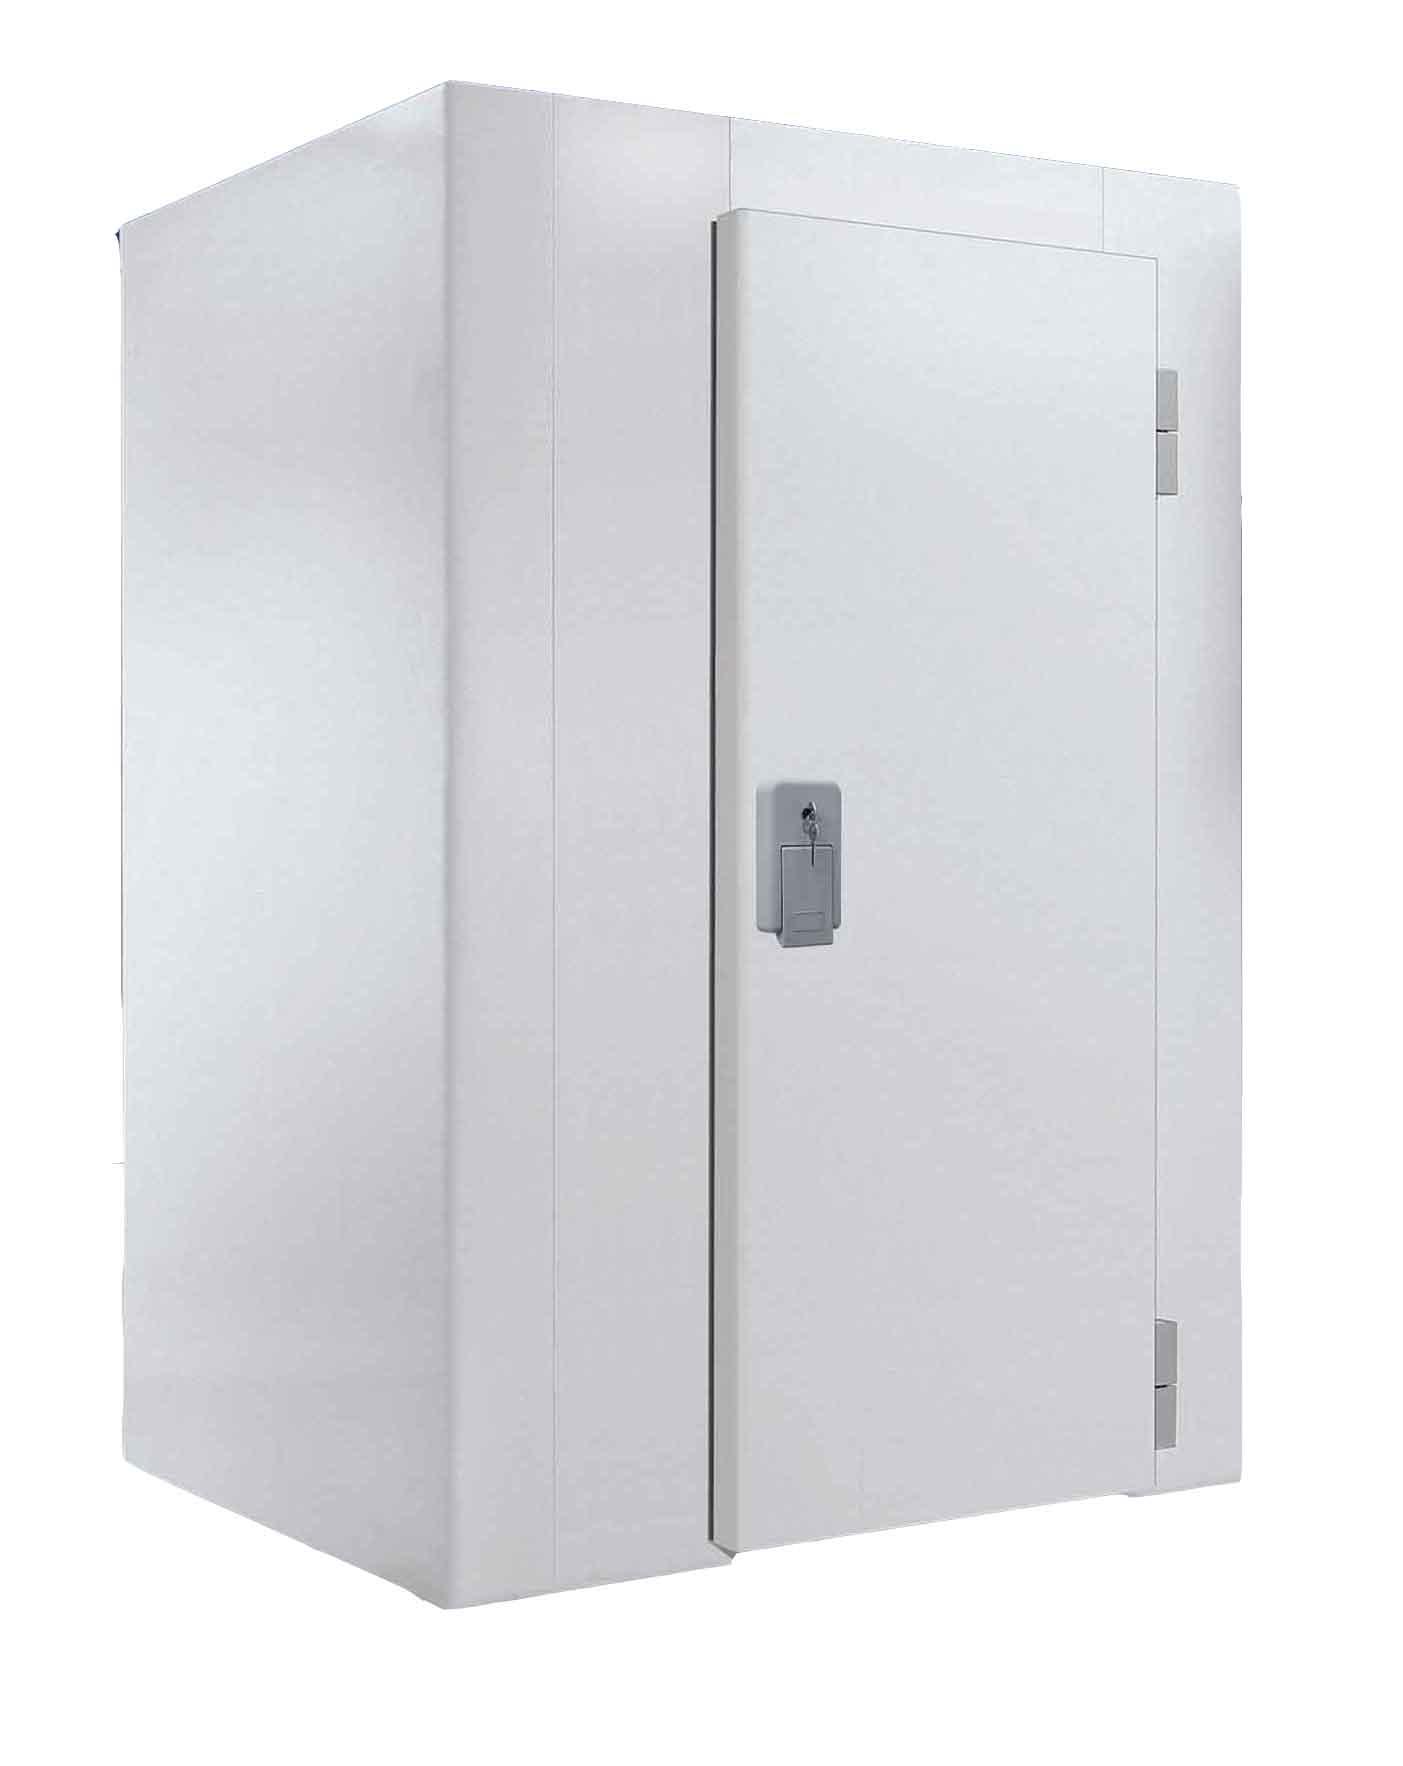 Piccolo room modular cold room range